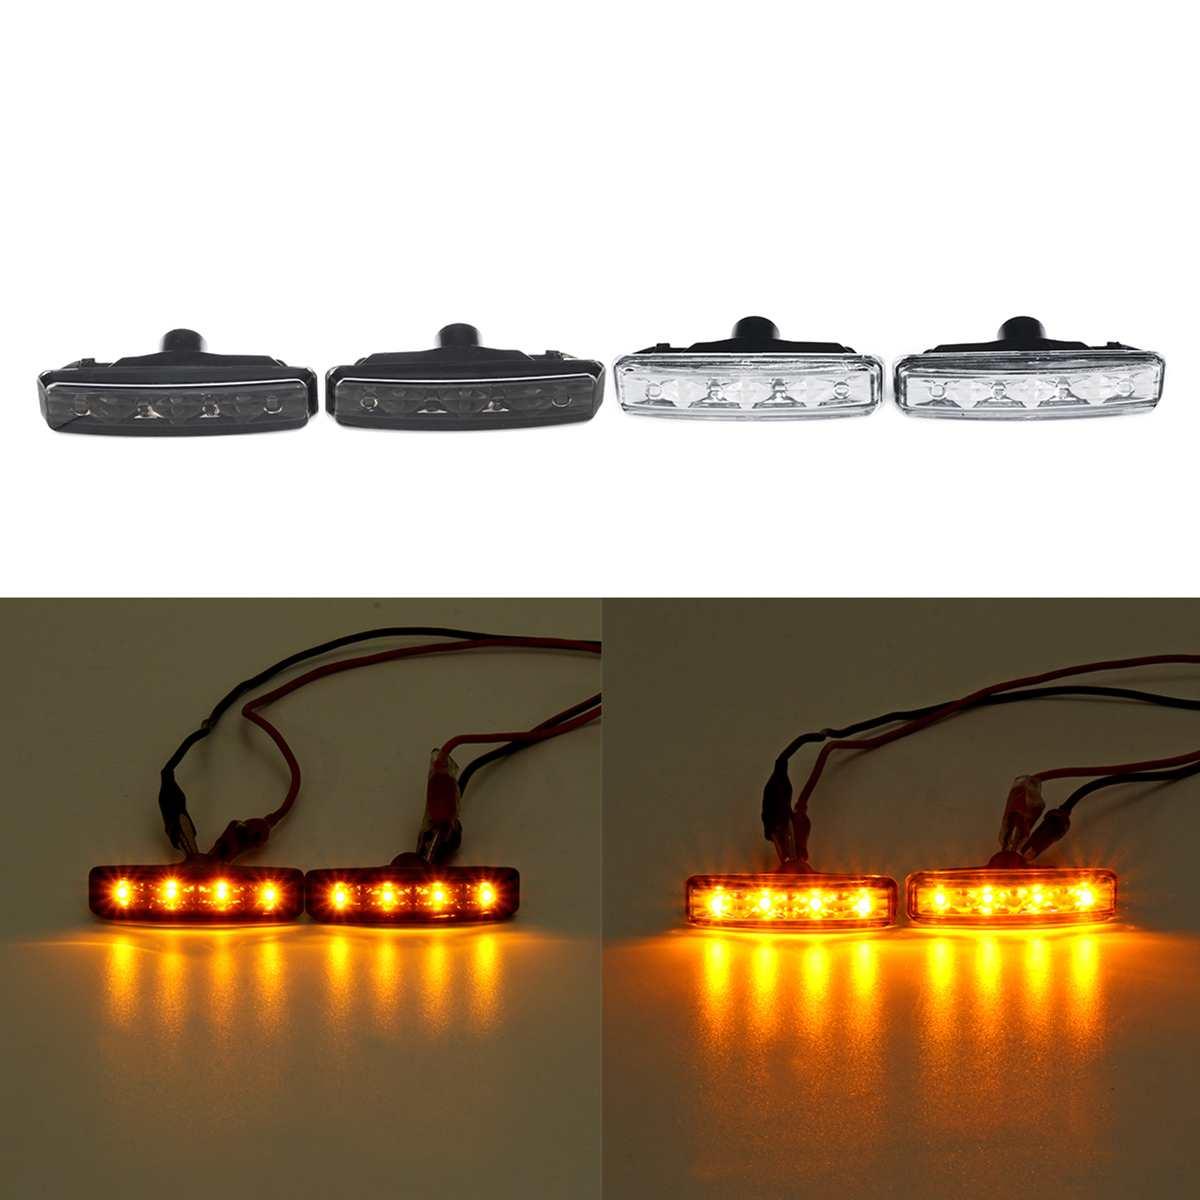 Pair Smoke Turn Indicator Side Marker Lights Lamps 63148360589 For BMW E39 1997 1998 1999 2000 2001-2003 Amber LED Signal light